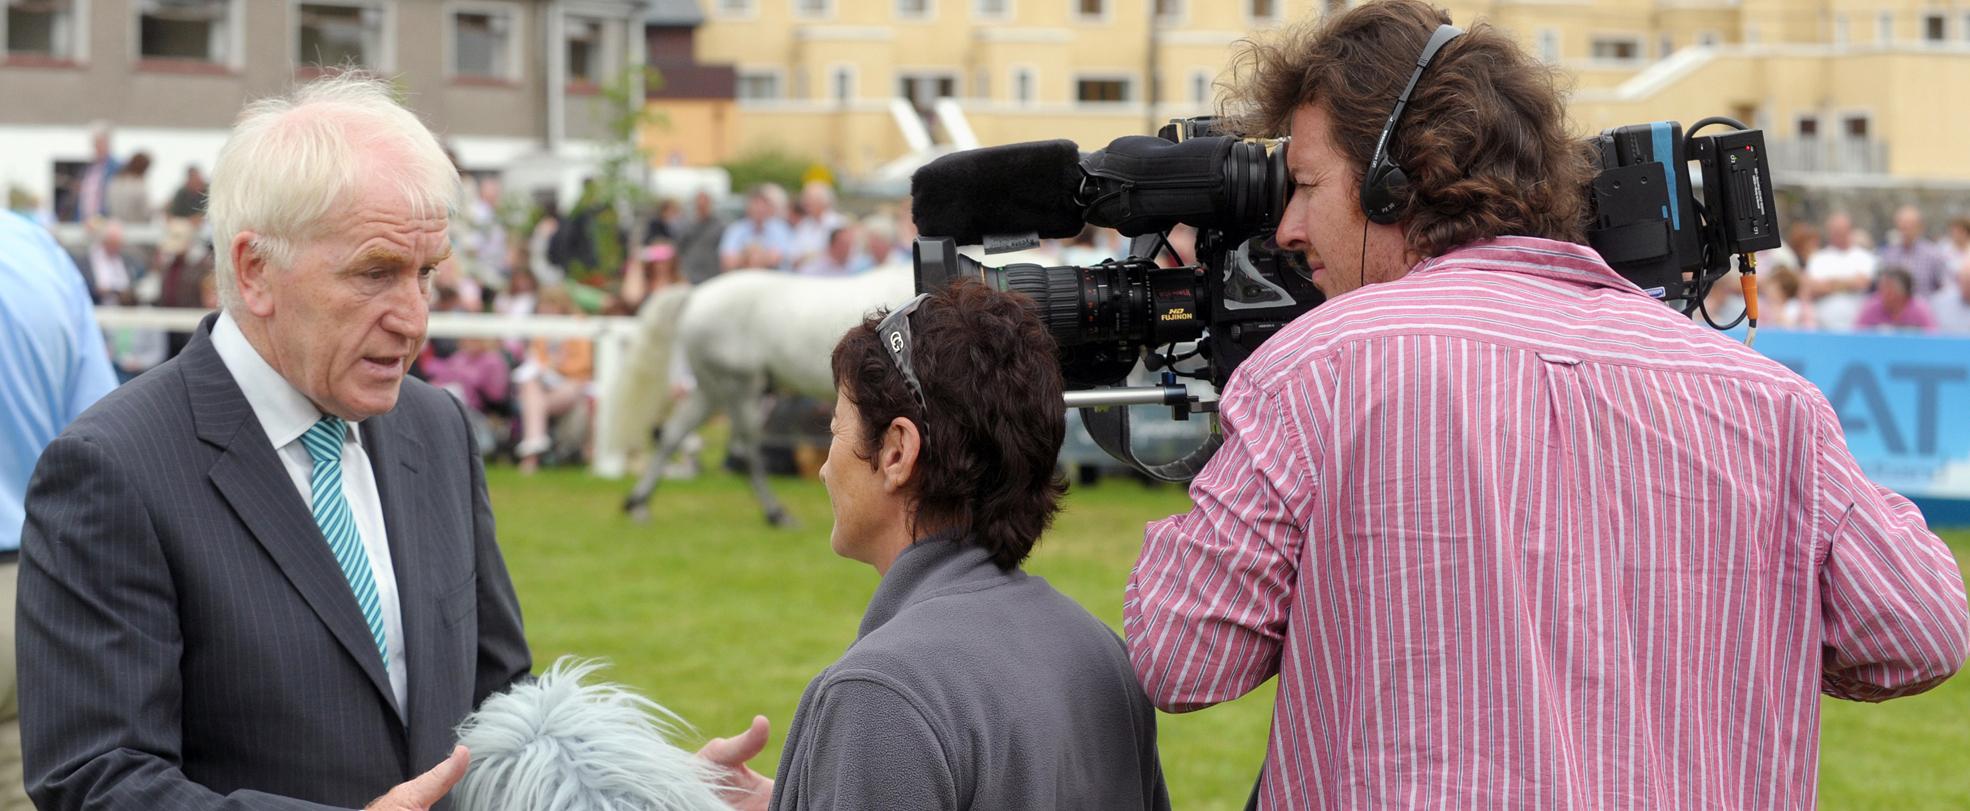 Video Production Kildare Bluesilk Productions